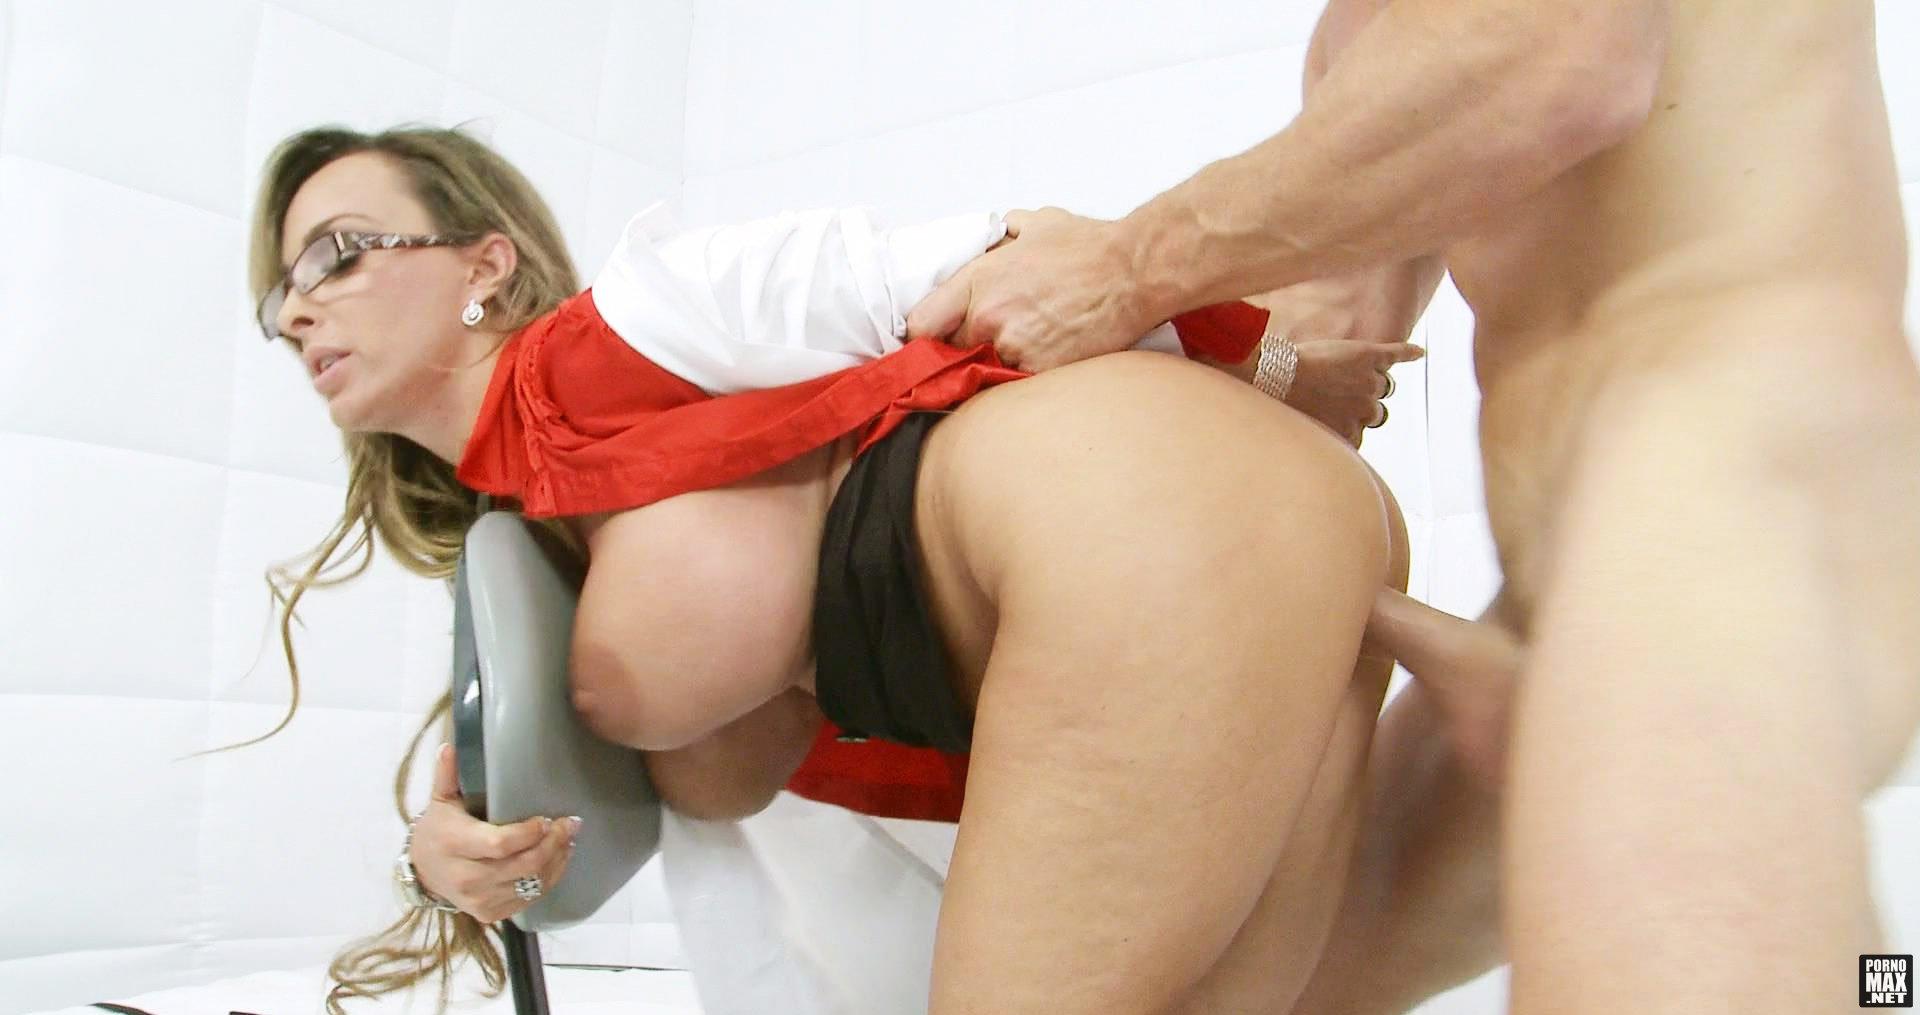 holly halston video porno italiani incesti